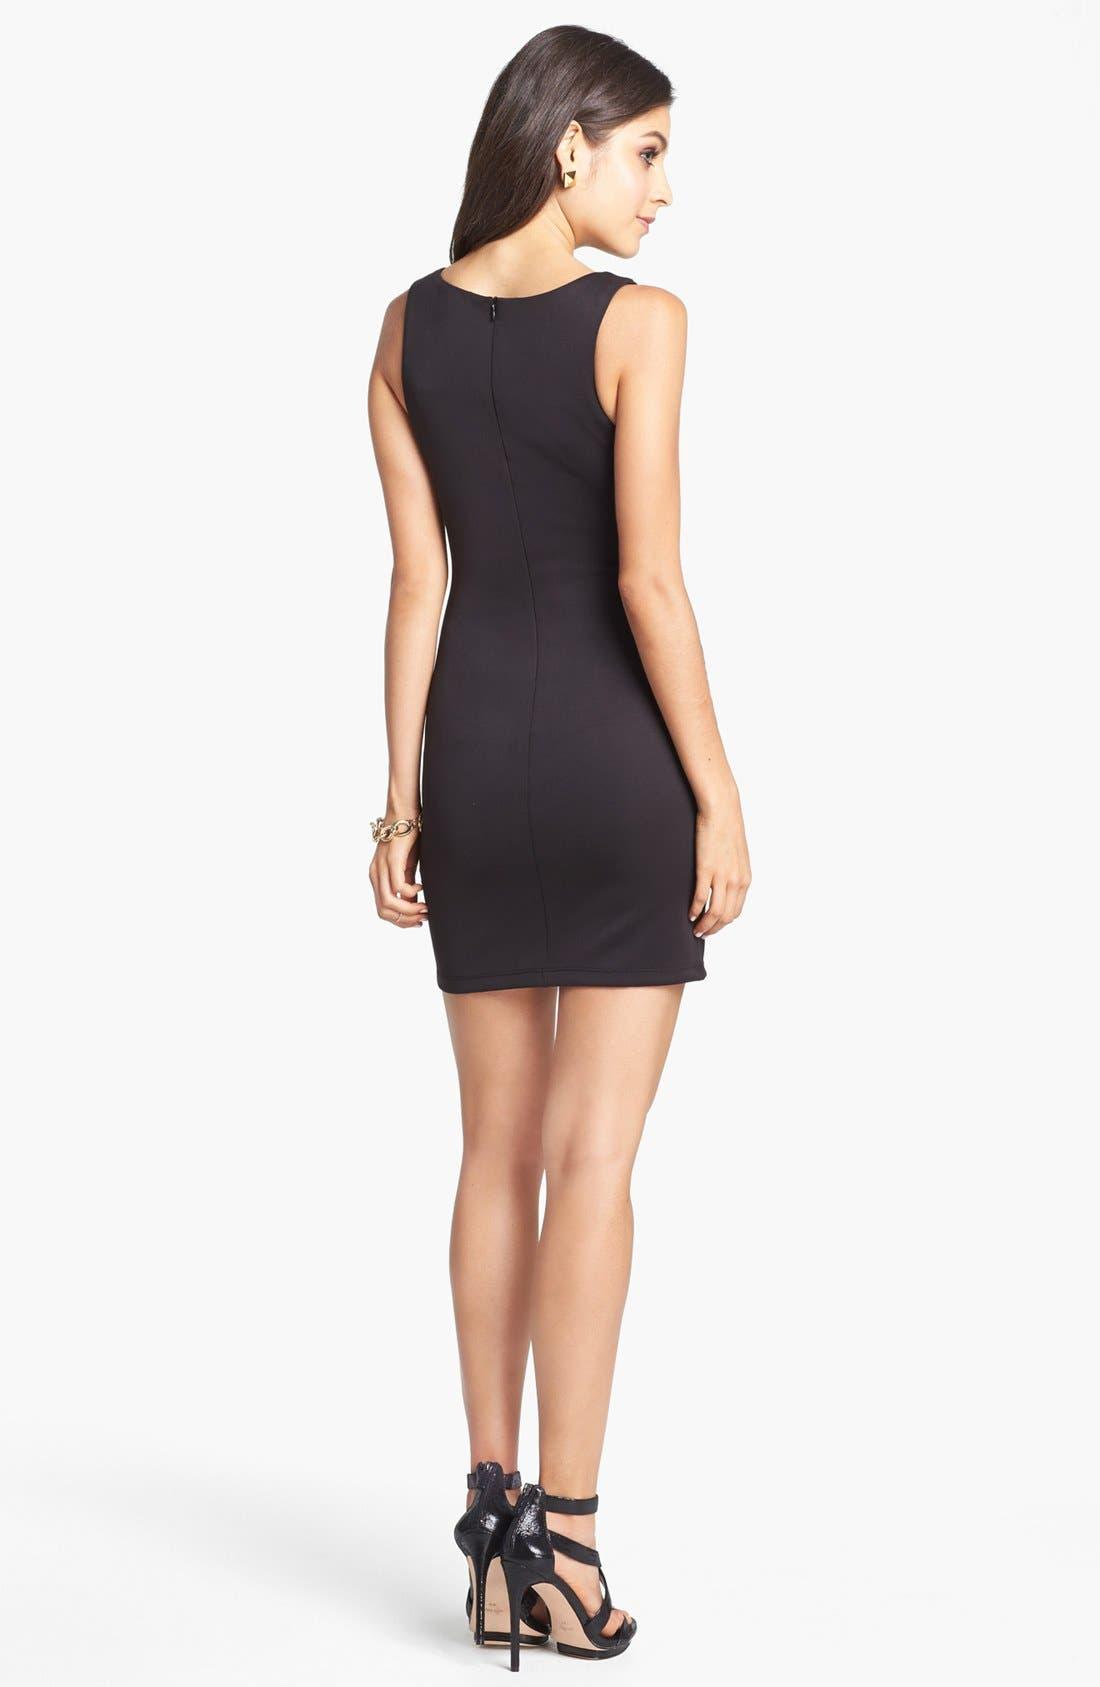 AS U WISH, Sequin Body-Con Dress, Alternate thumbnail 3, color, 001